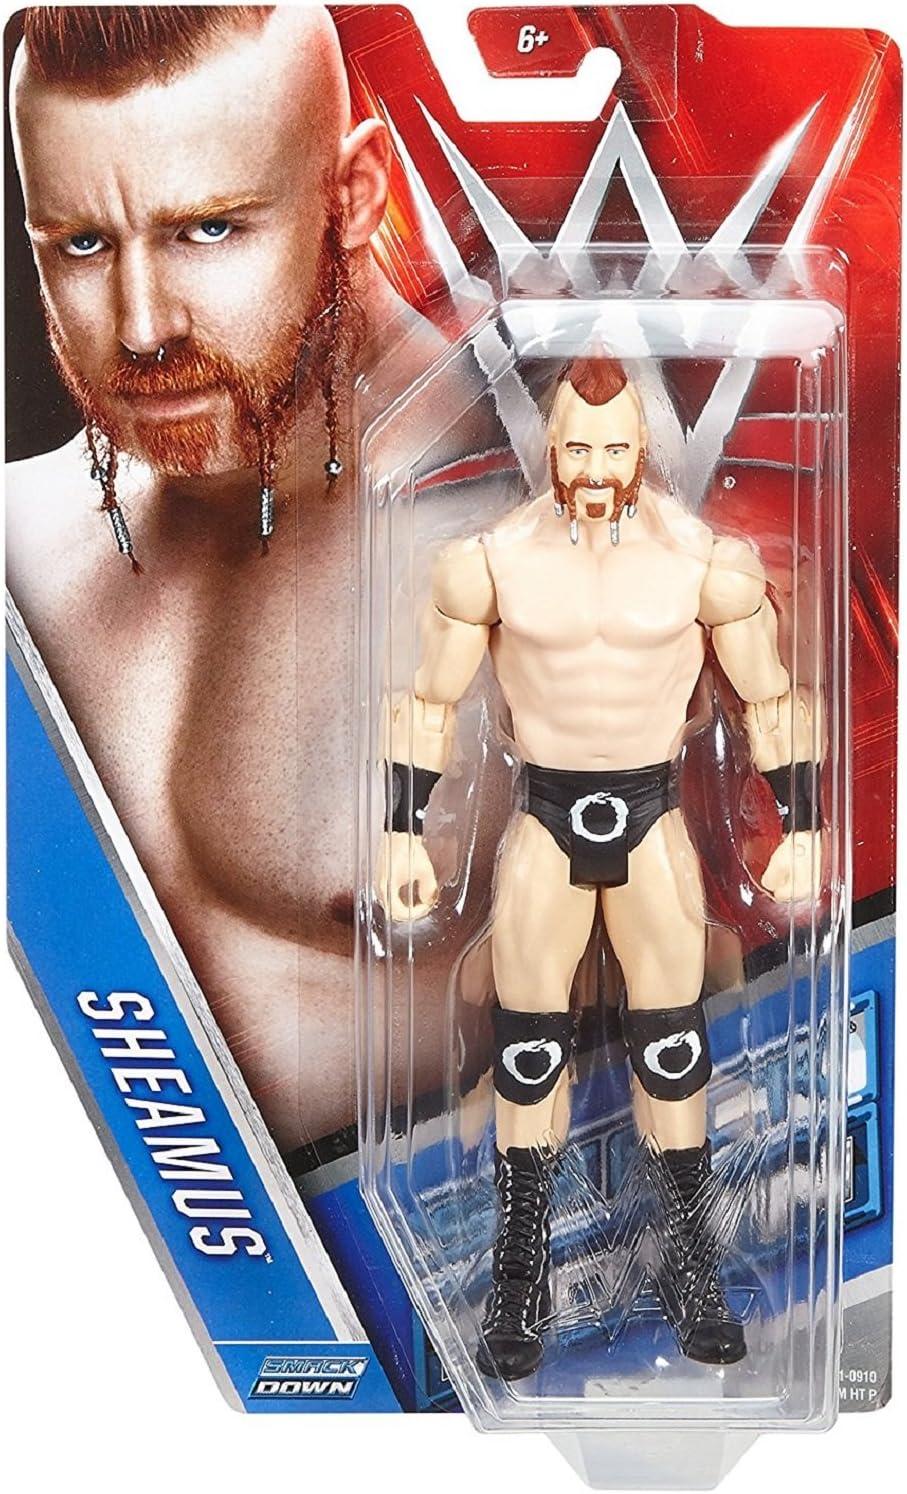 WWE Create A WWE Superstar SHEAMUS Action Figure w//Tattoo Sheet!